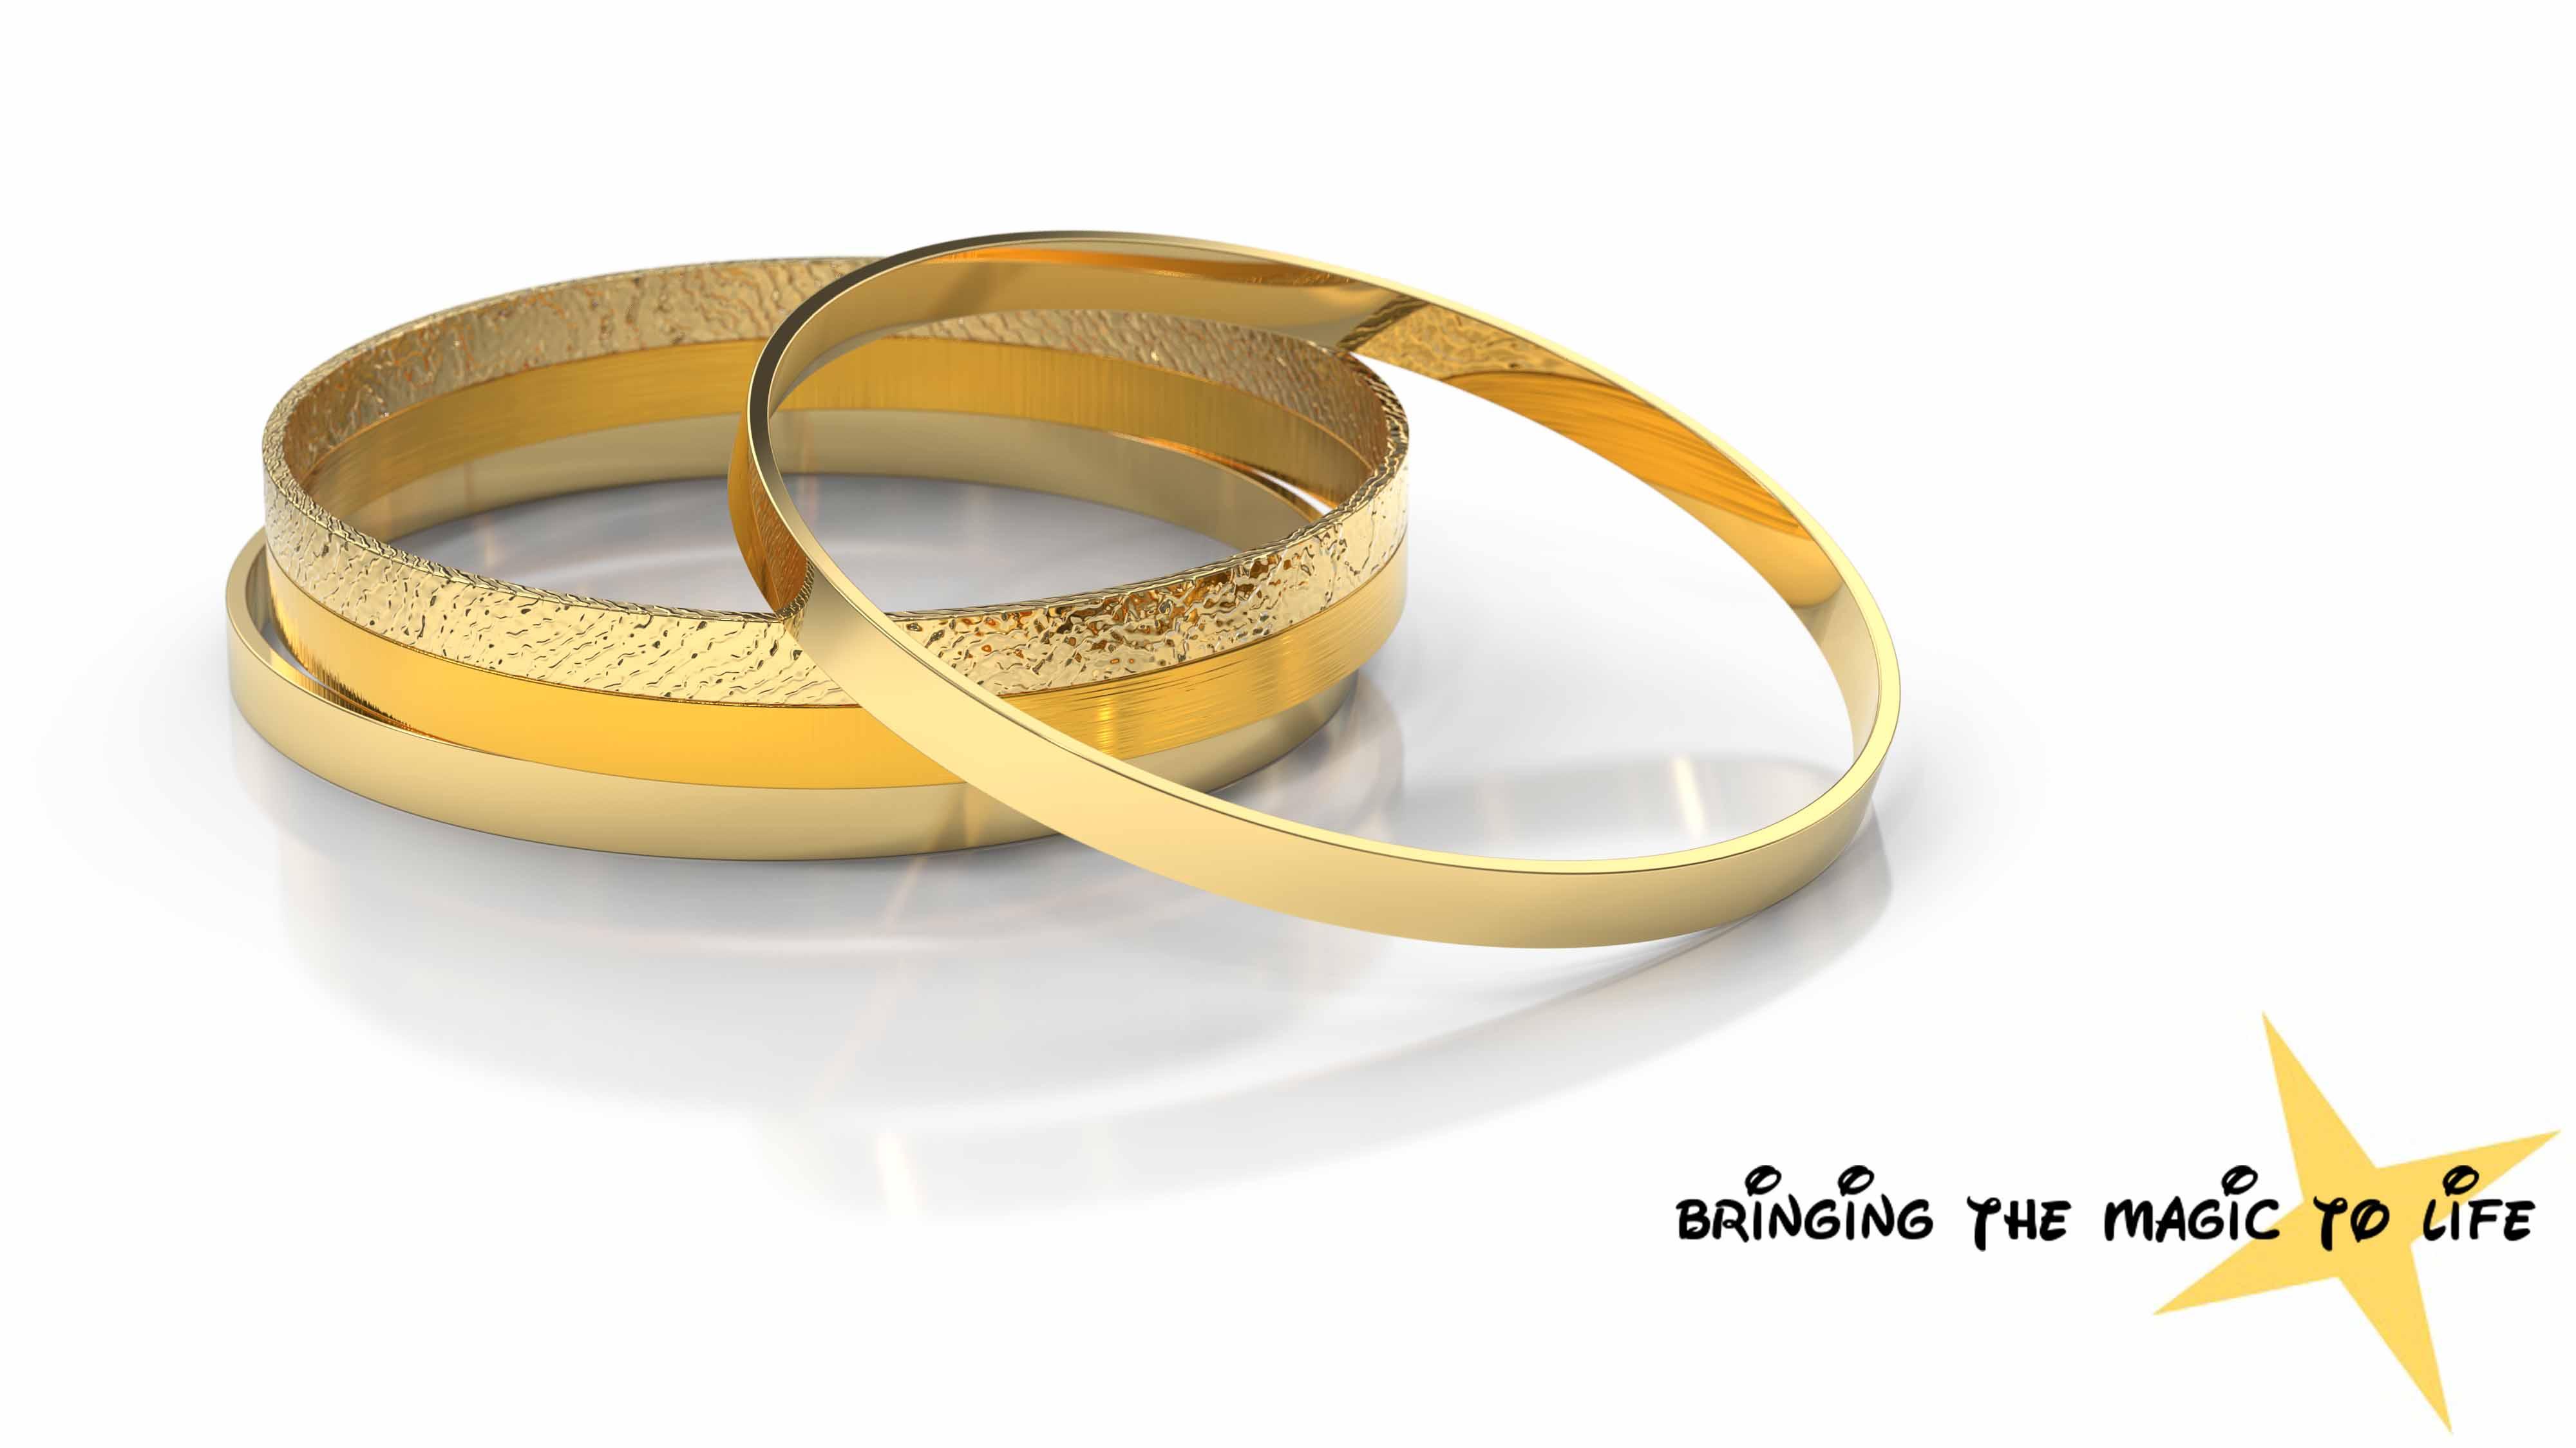 Esmeralda's Golden Bangles